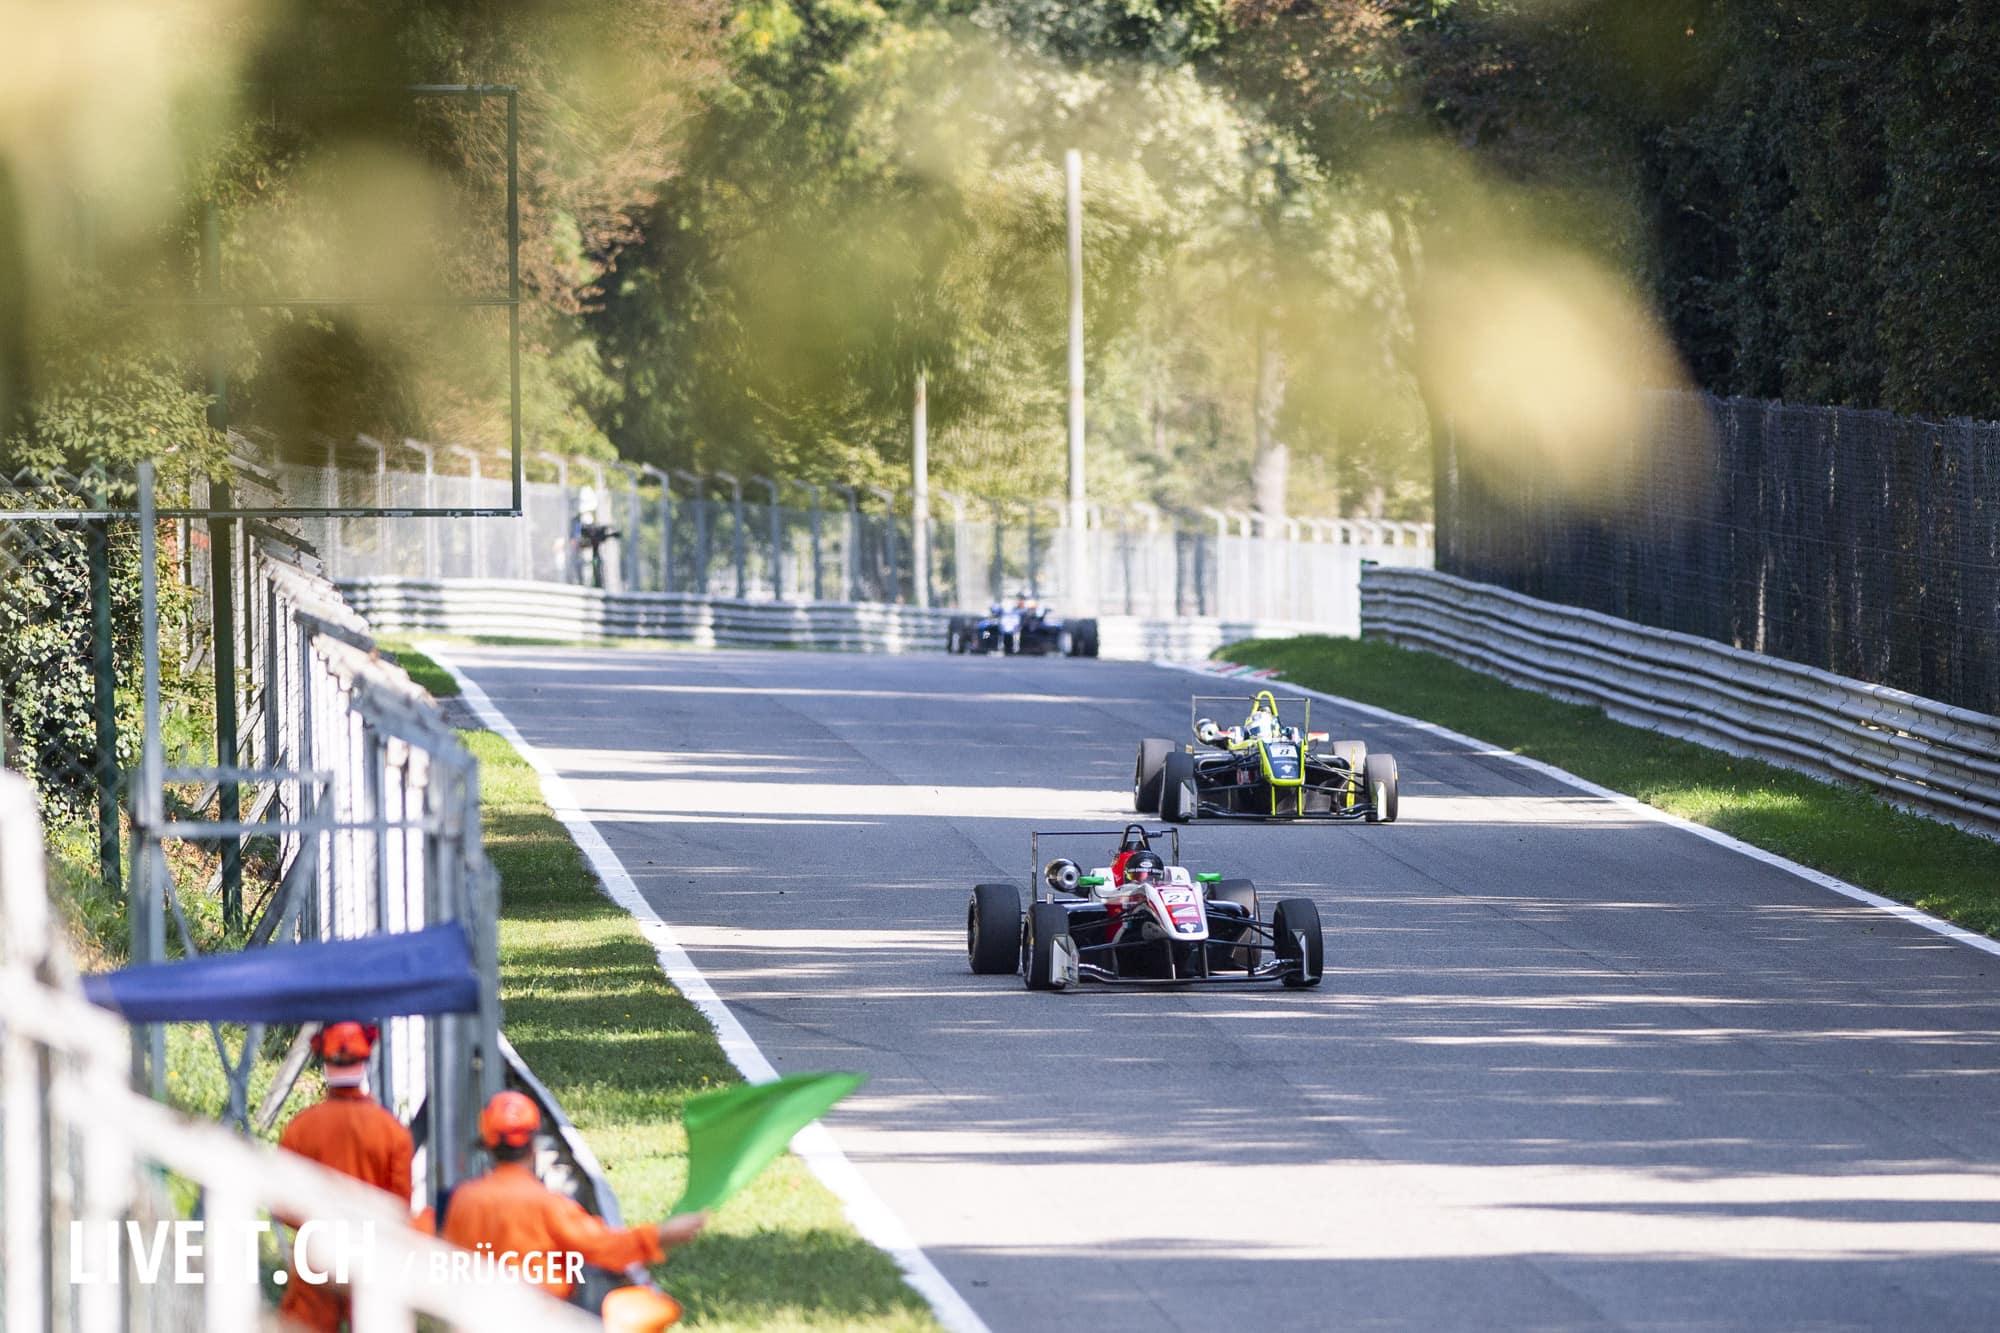 Euroformula Open, Race 2 am Sonntag 23. September 2018 in Monza (Fotografiert von Dominic Bruegger für liveit.ch)